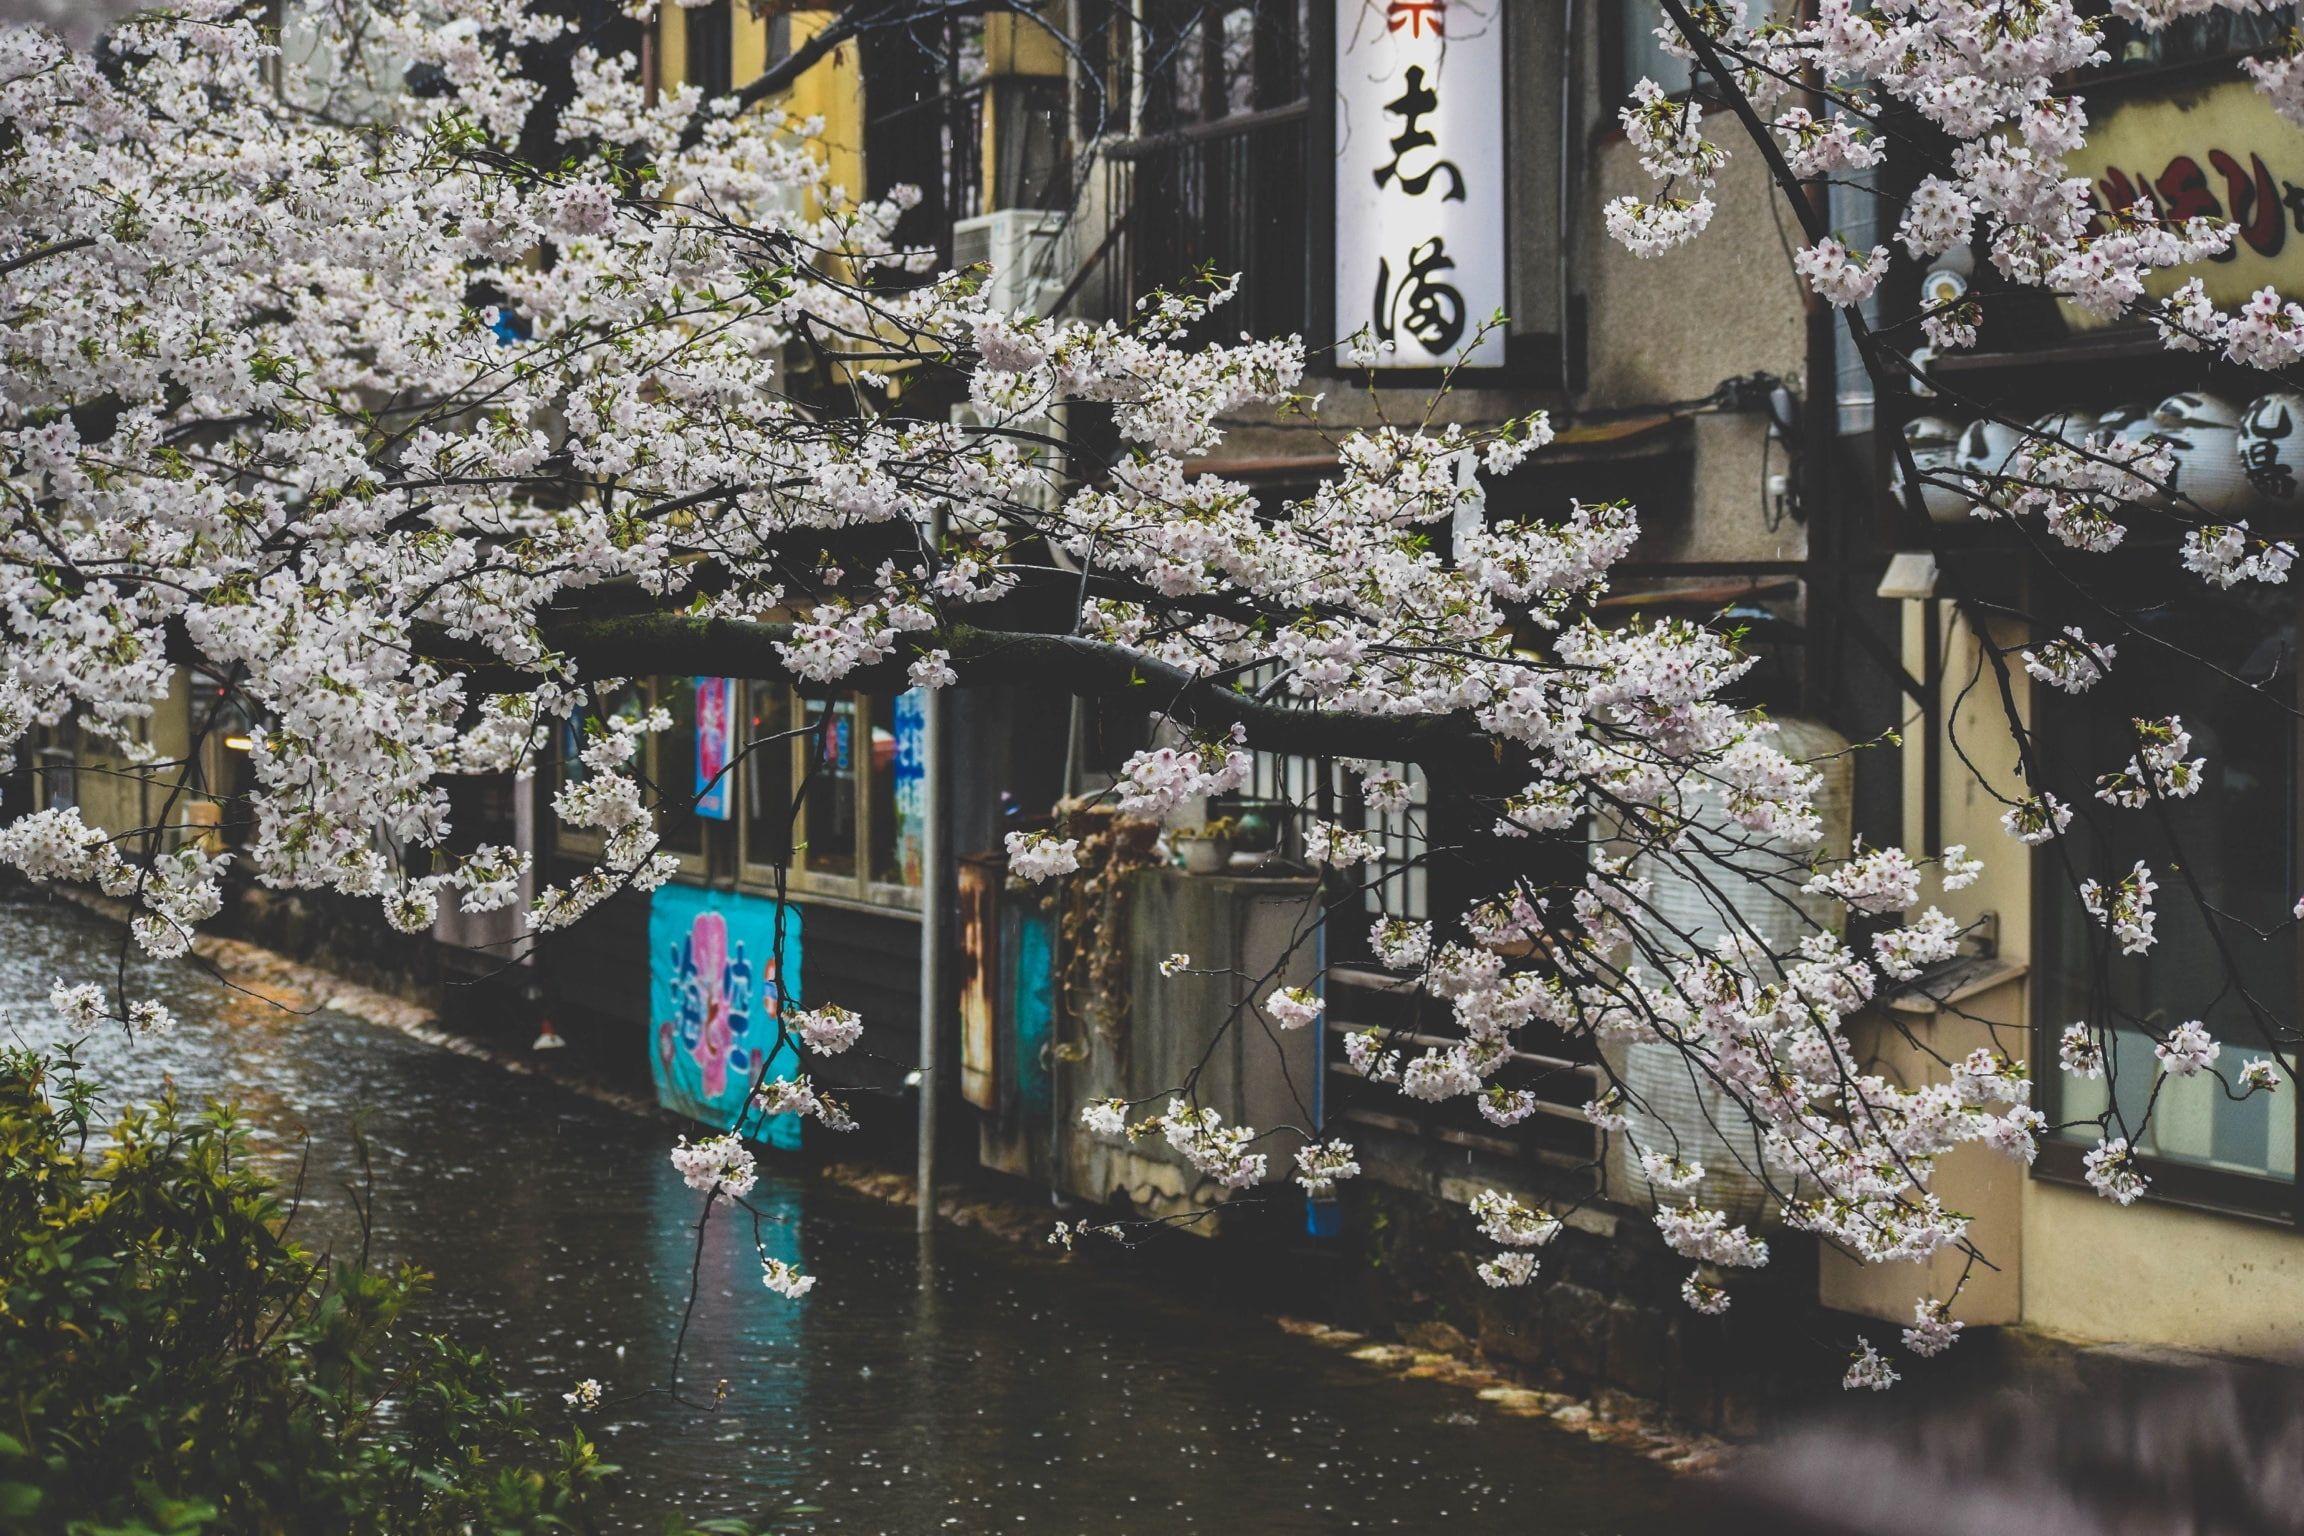 Japan Street Plants Rain Urban Cherry Blossom 1080p Wallpaper Hdwallpaper Desktop Cherry Blossom Wallpaper Desktop Wallpaper Wallpaper